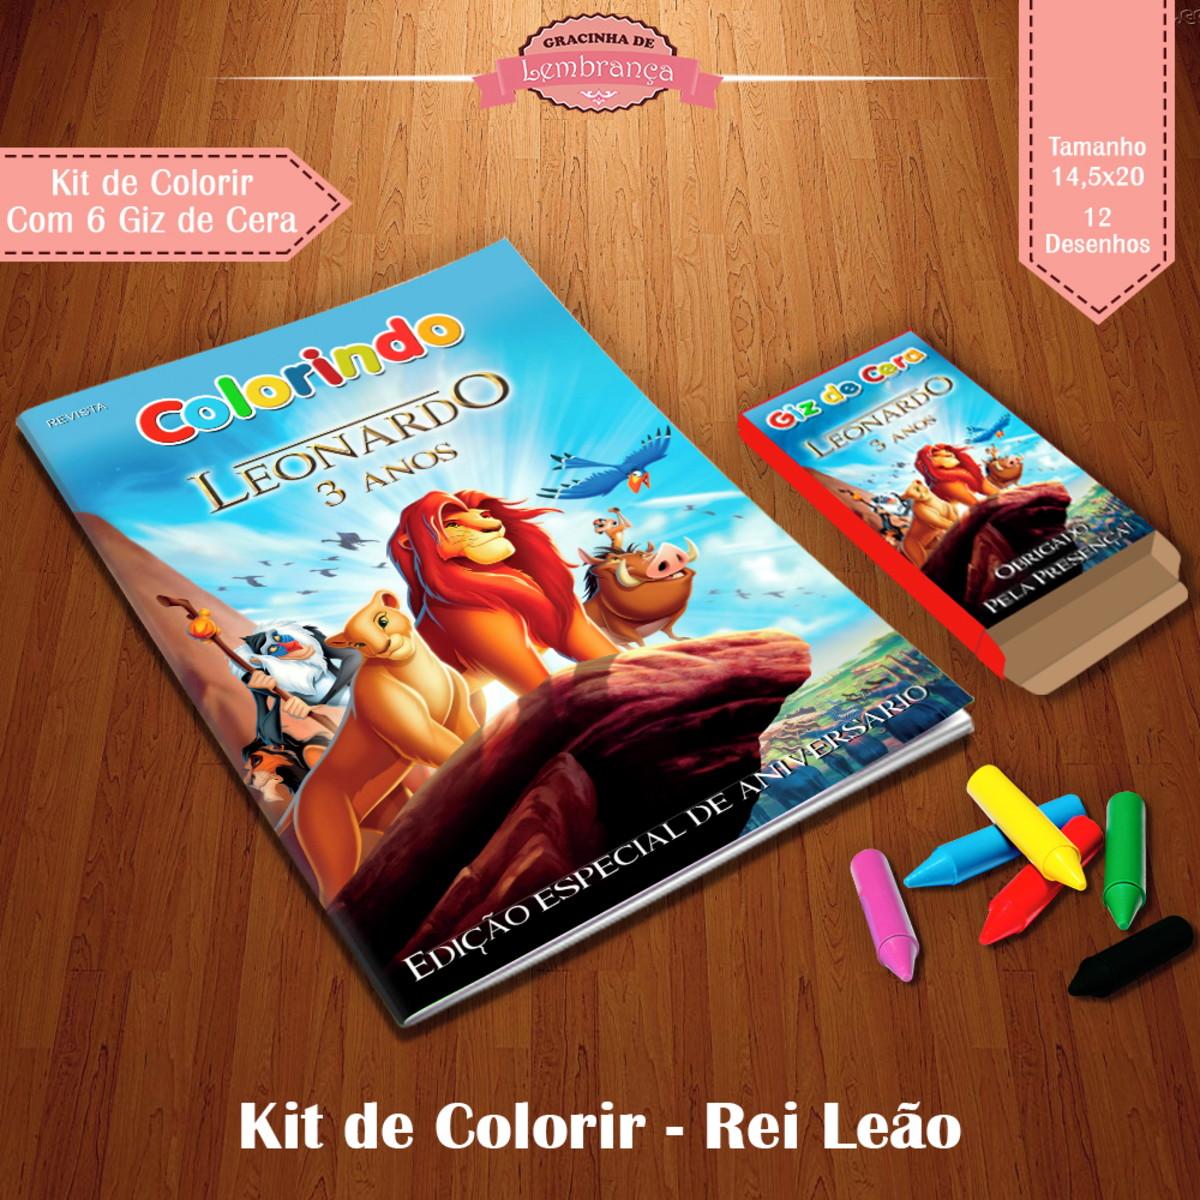 Kit De Colorir Rei Leao No Elo7 Gracinha De Lembranca Fcd601